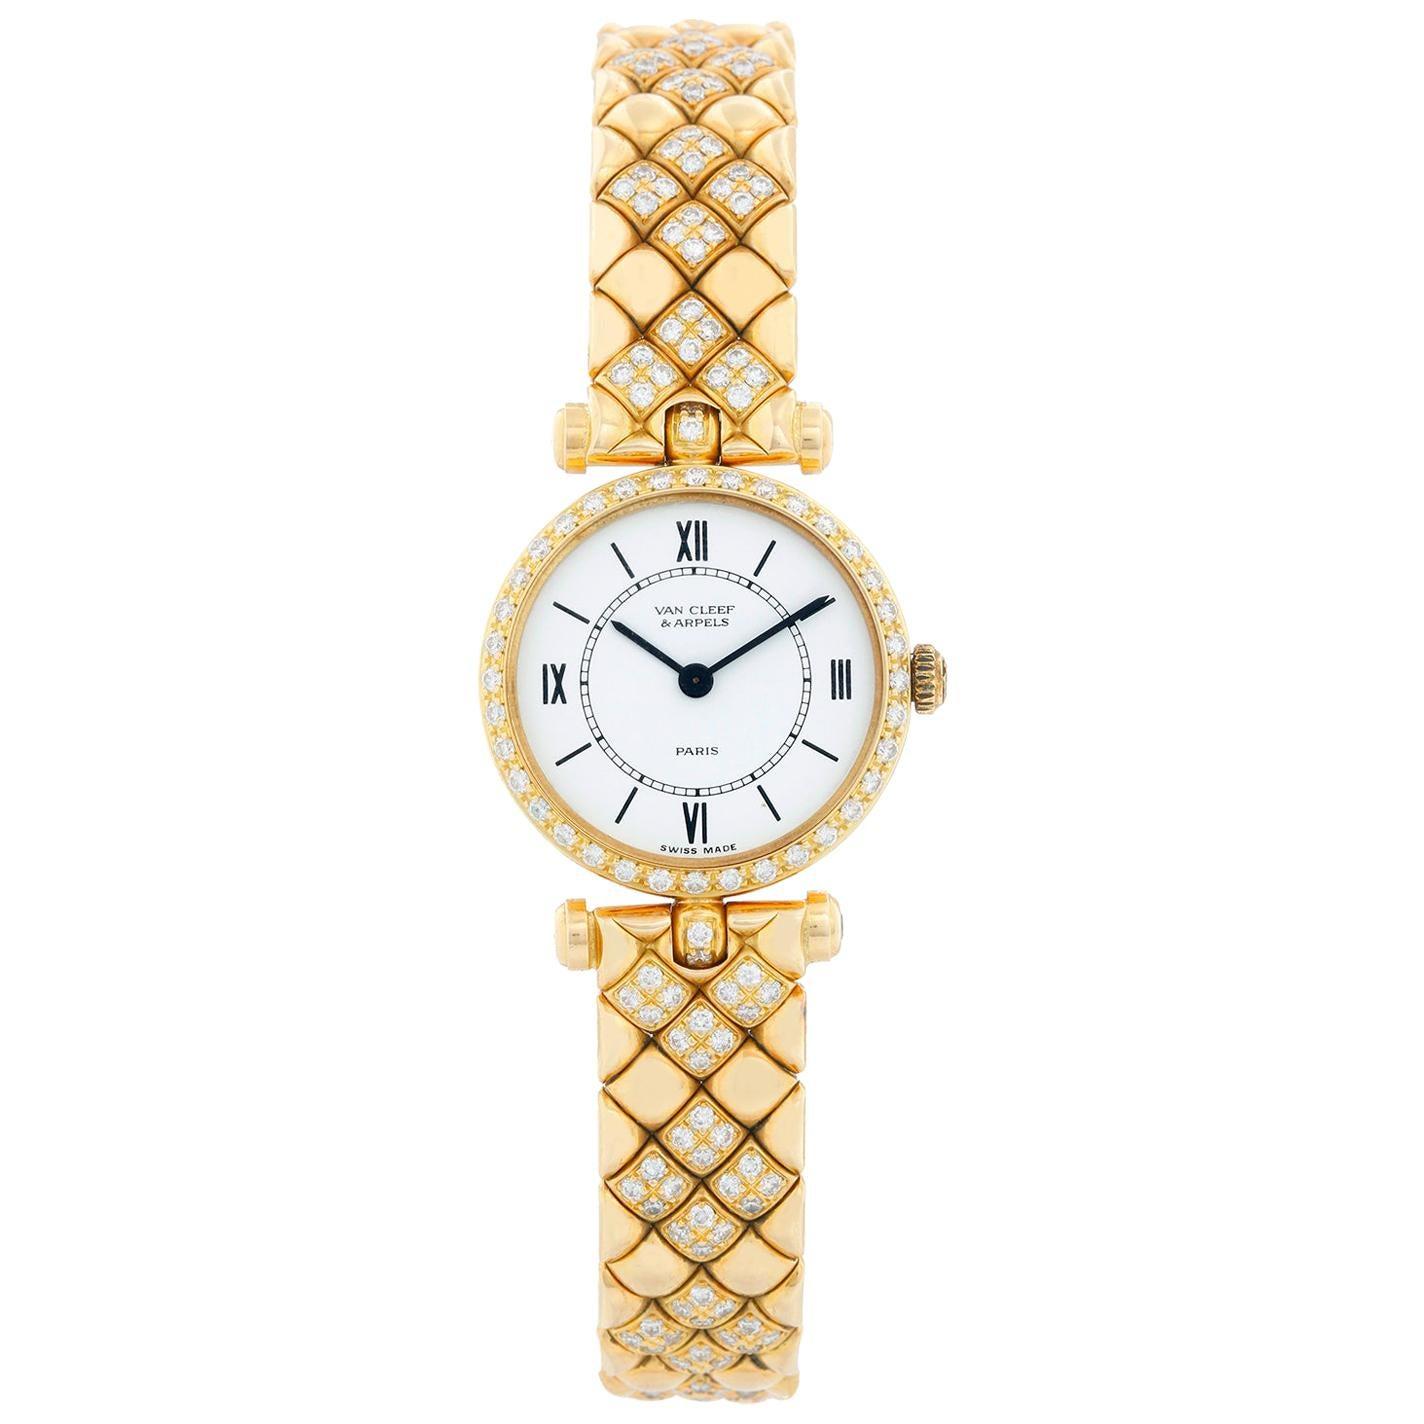 Van Cleef & Arpels Classique Paris Ladies Watch 18901B1